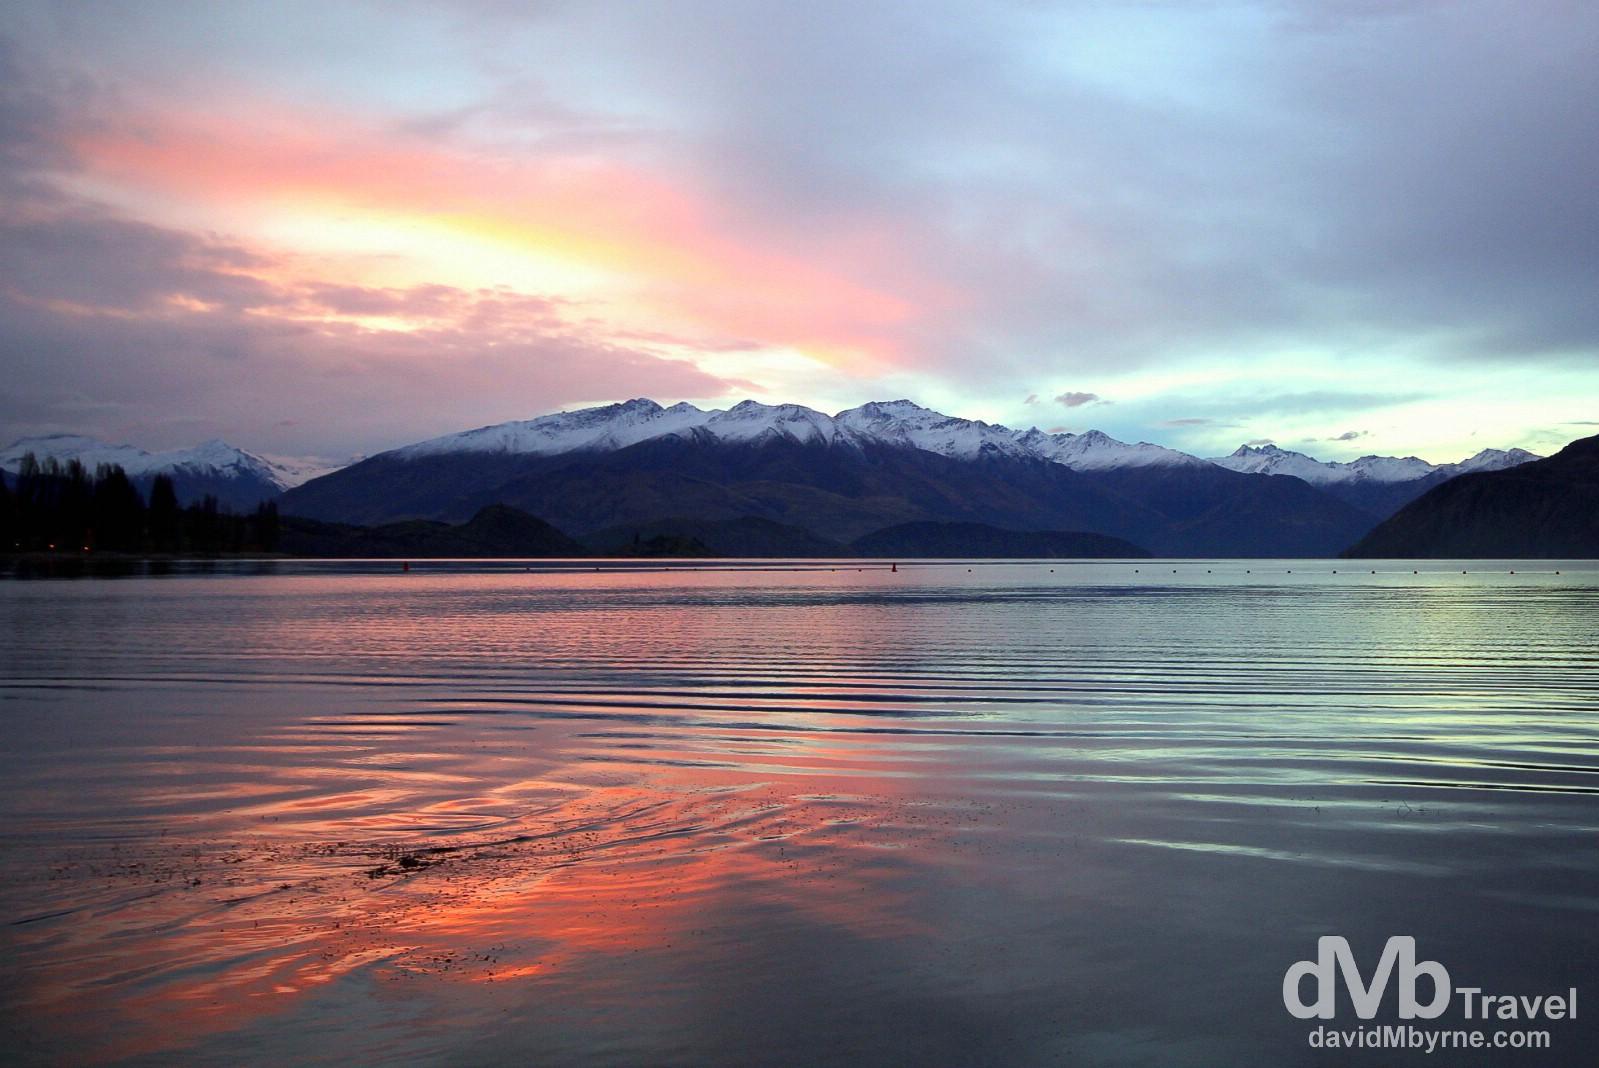 Fading sunset as seen from the shores of Lake Wanaka, Wanaka, South Island, New Zealand. May 20th 2012.